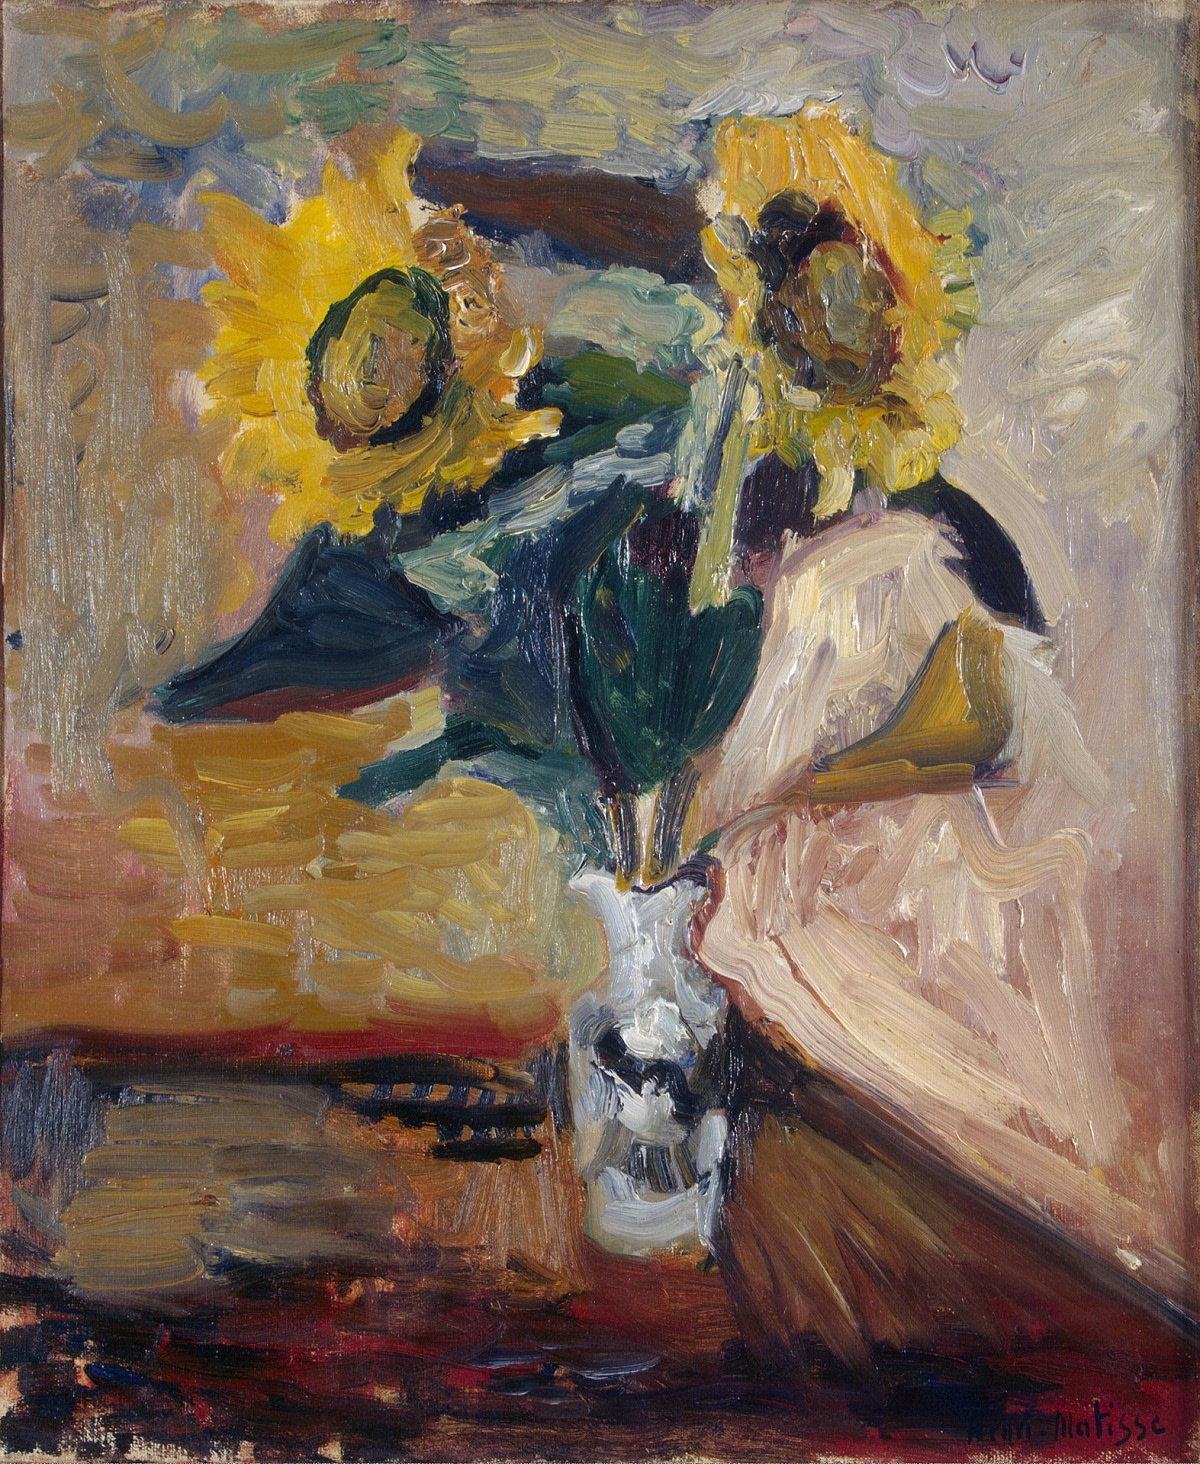 Matisse's Vase of Sunflowers (1898) | Source: hermitagemuseum.org